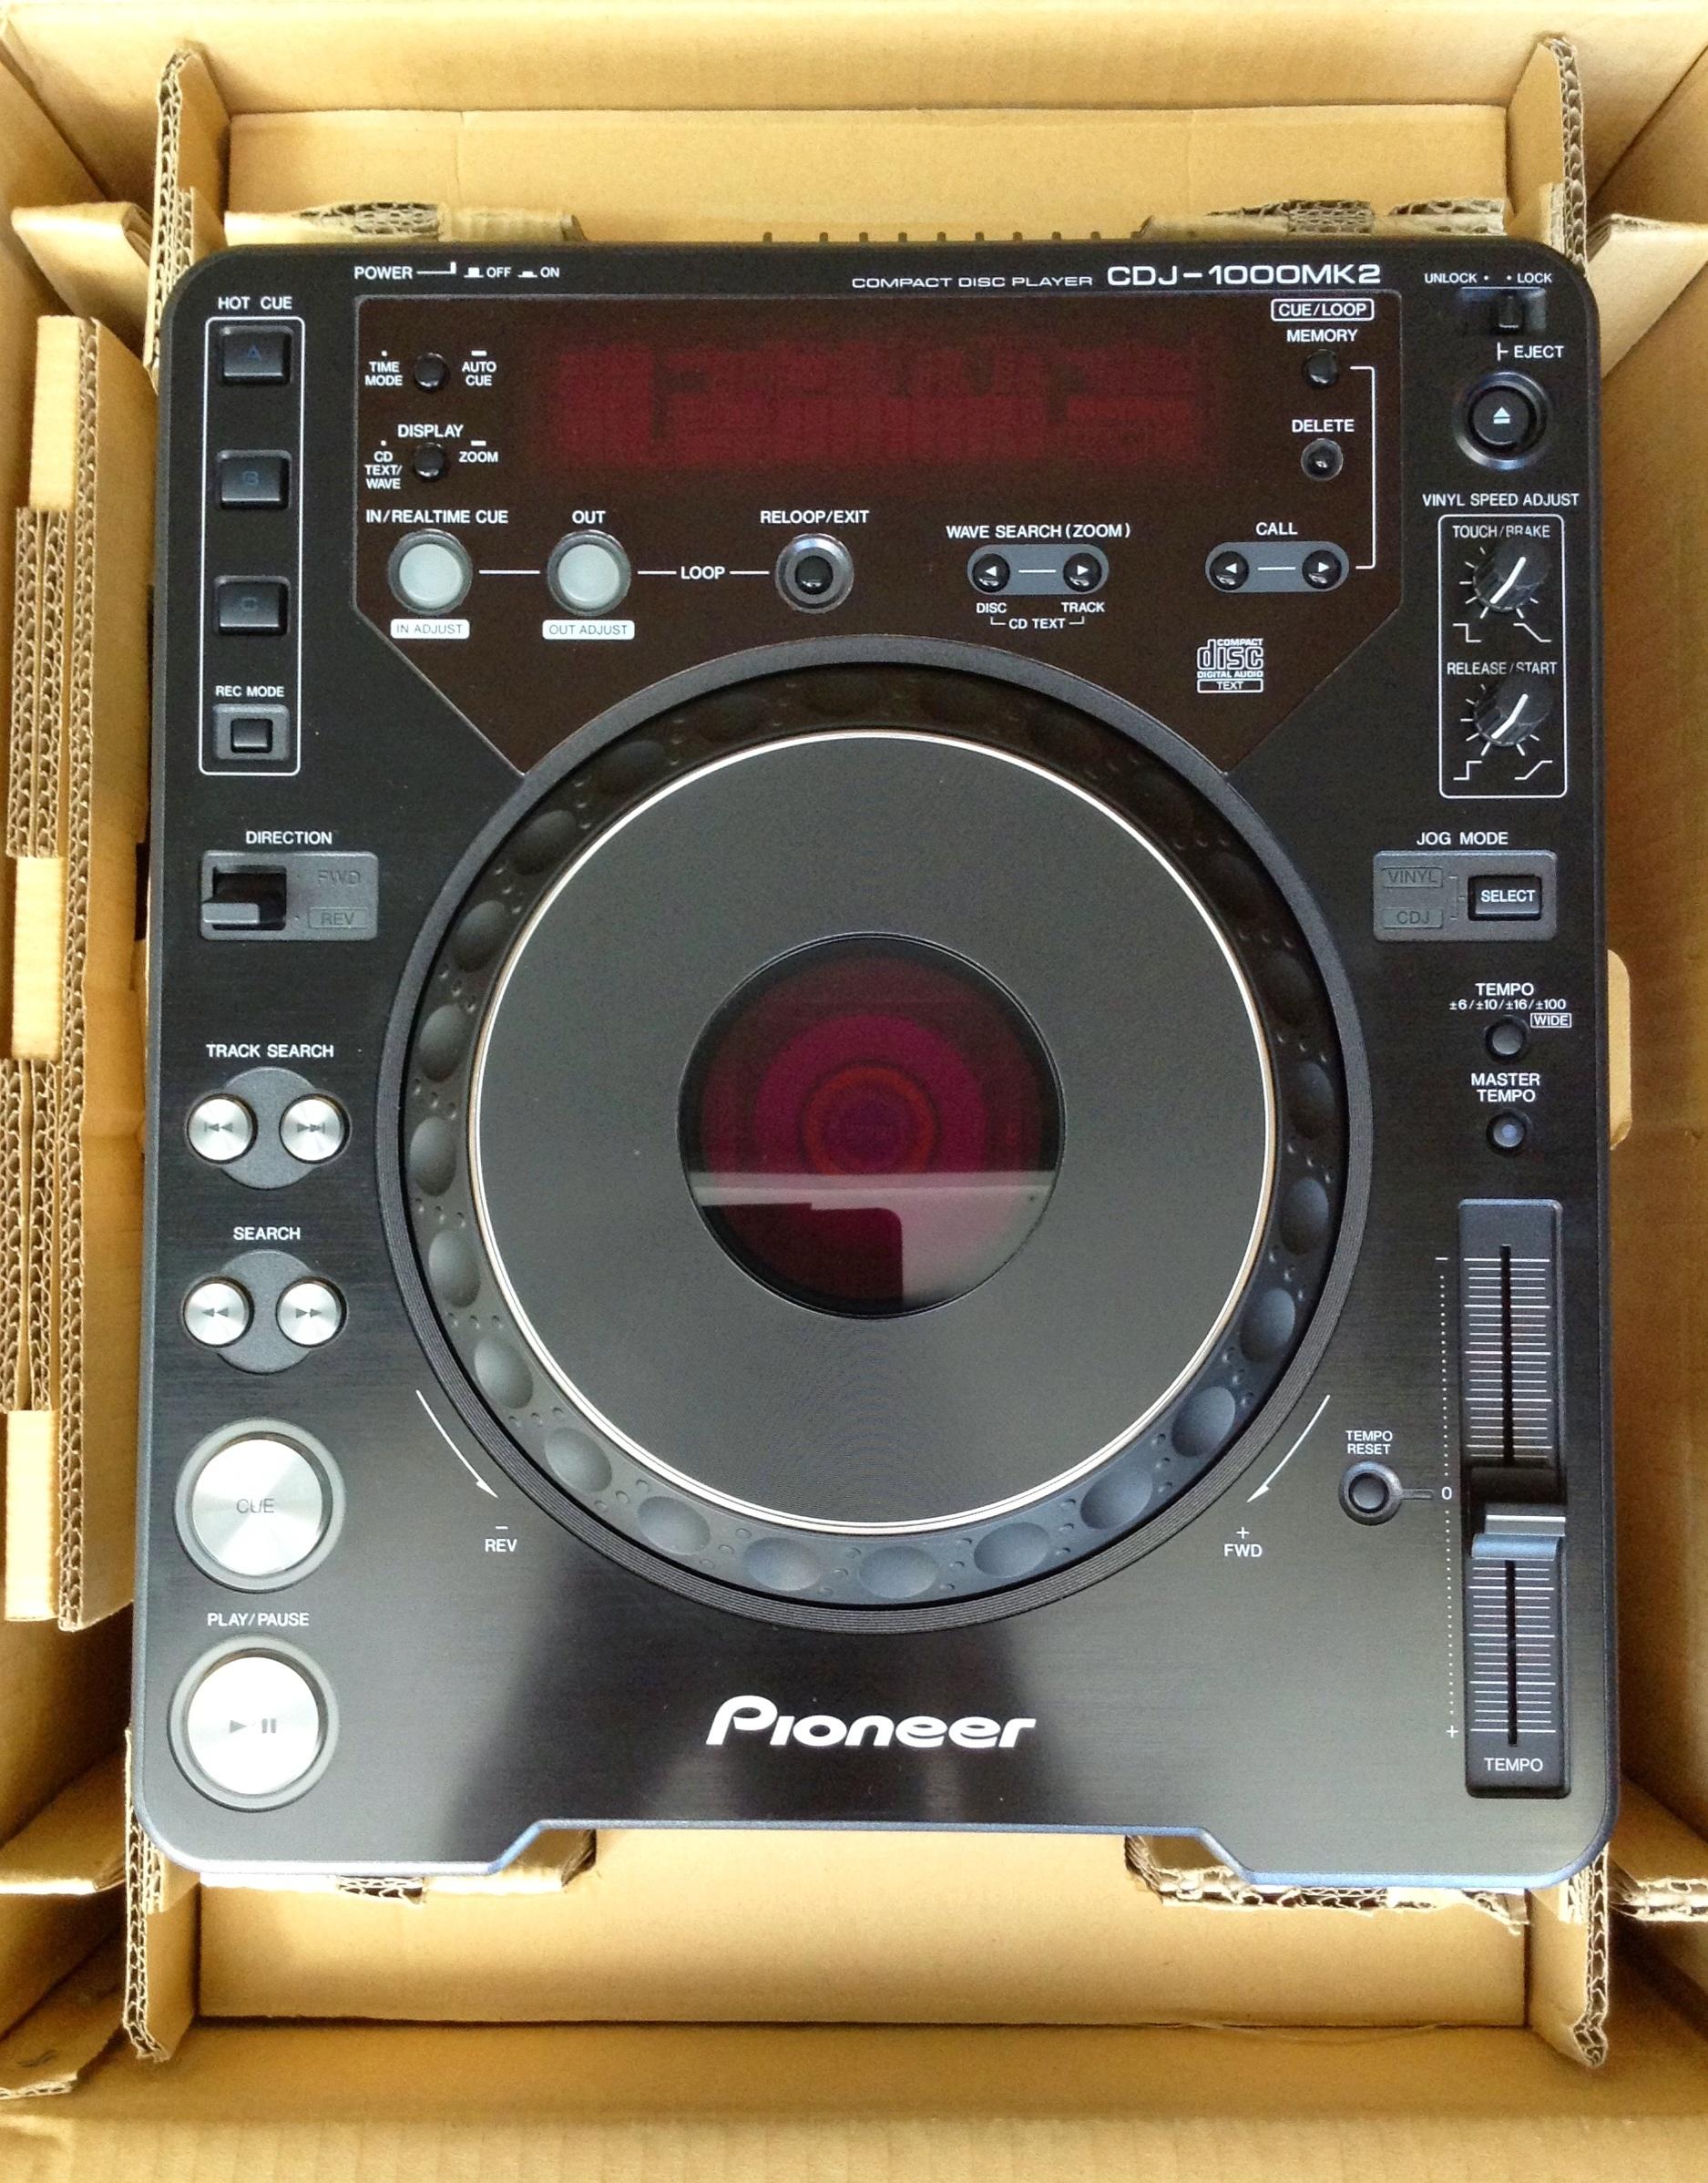 pin pioneer cdj - photo #44